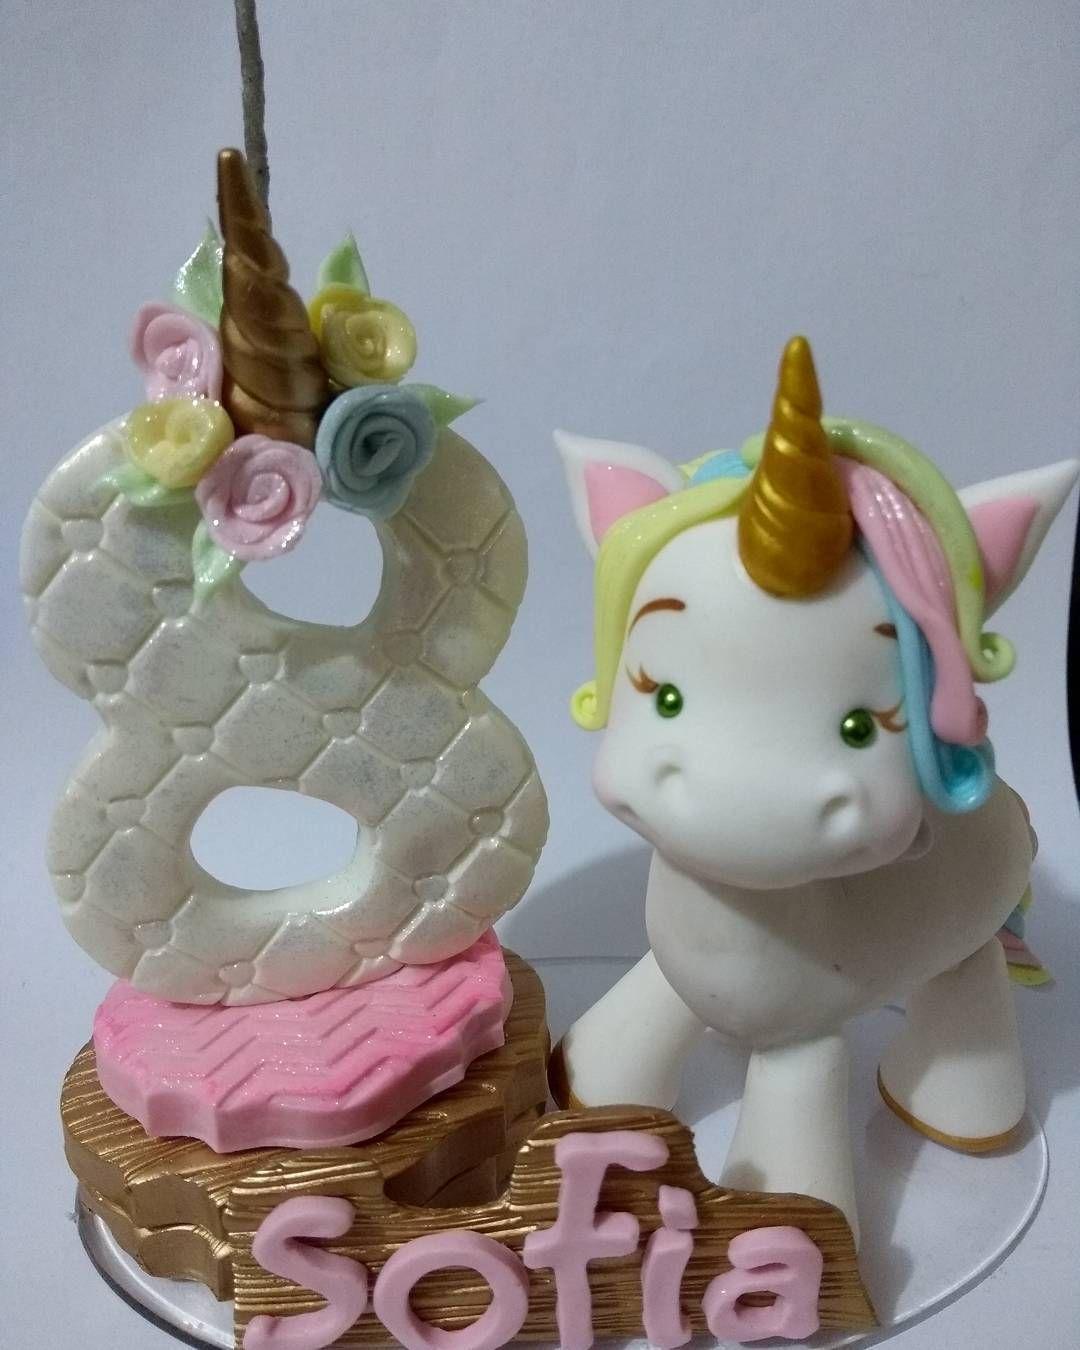 Artesanato Residencial San Miguel De Allende ~ Amei fazer! #biscuit #porcelanafria #coldporcelain #unicornio #unicorn #artesanato #